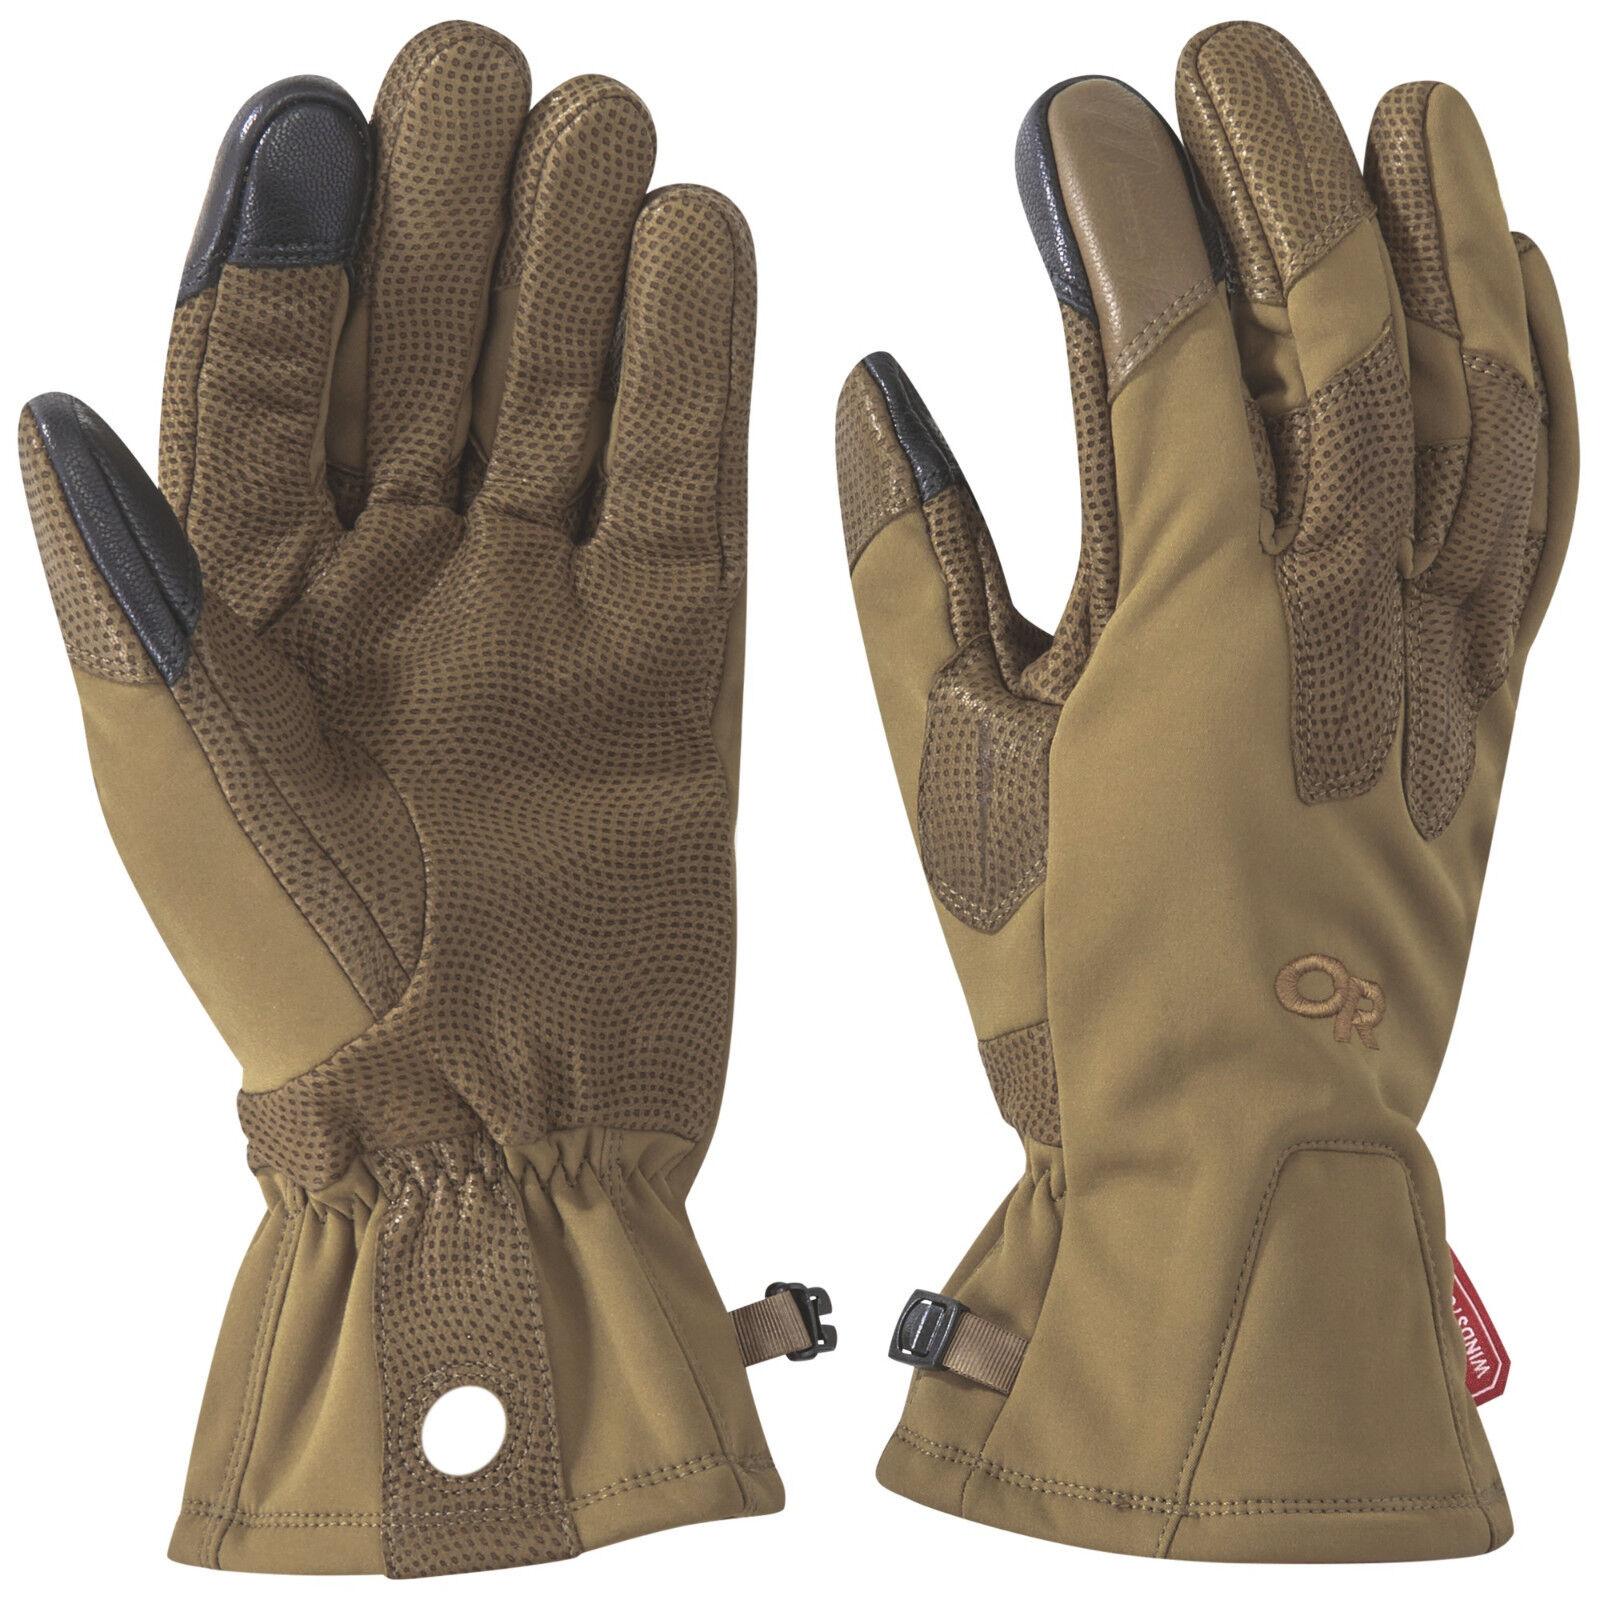 Outdoor Research Research Research Paradigma Sensor Handschuhe Kojote Braun    Zu verkaufen  511045